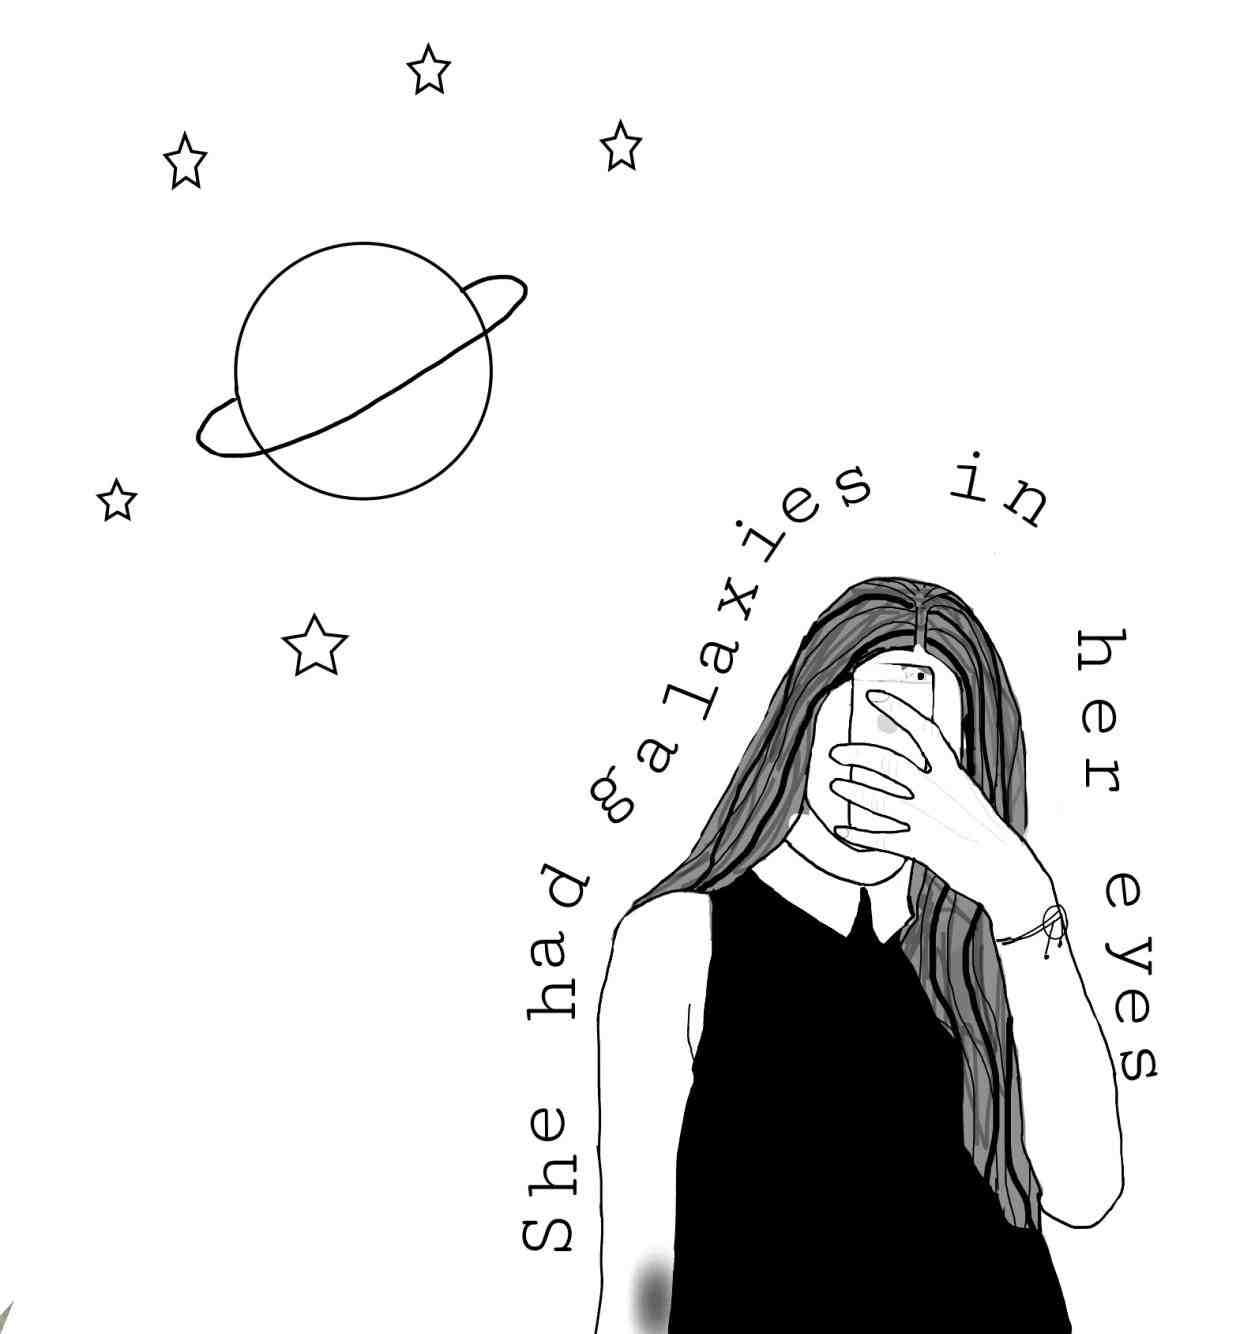 1240x1334 Black White Tumblr Drawings Tumblr Drawings Hipster Black